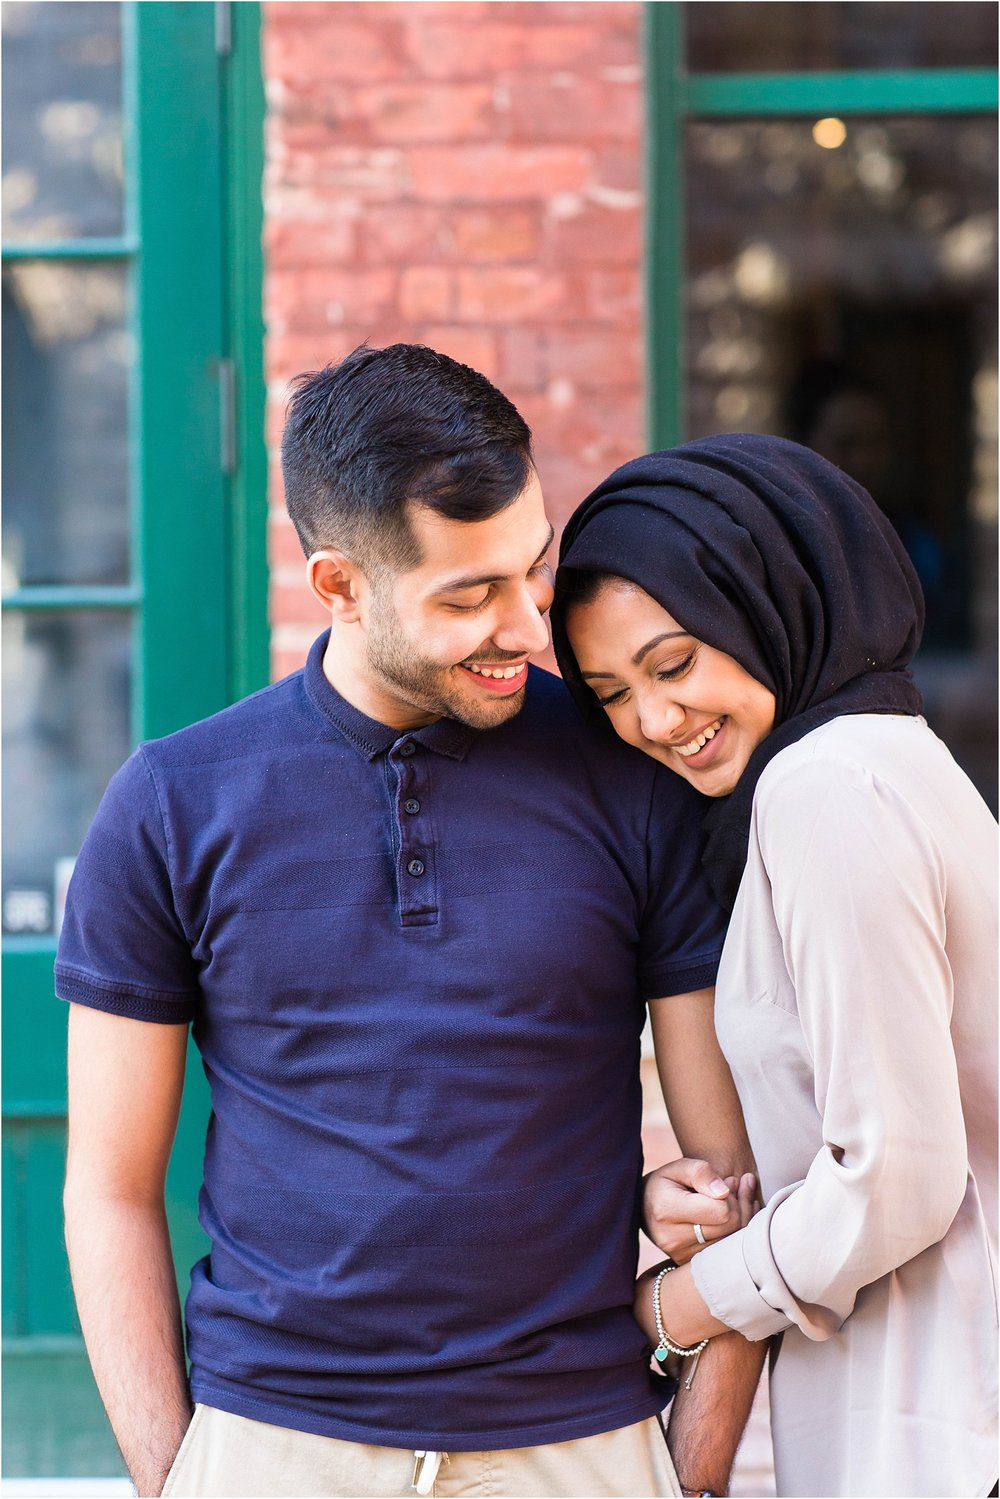 Distillery-District-Humber-Bay-Park-Engagement-Toronto-Mississauga-Brampton-Scarborough-GTA-Pakistani-Indian-Wedding-Engagement-Photographer-Photography_0004.jpg